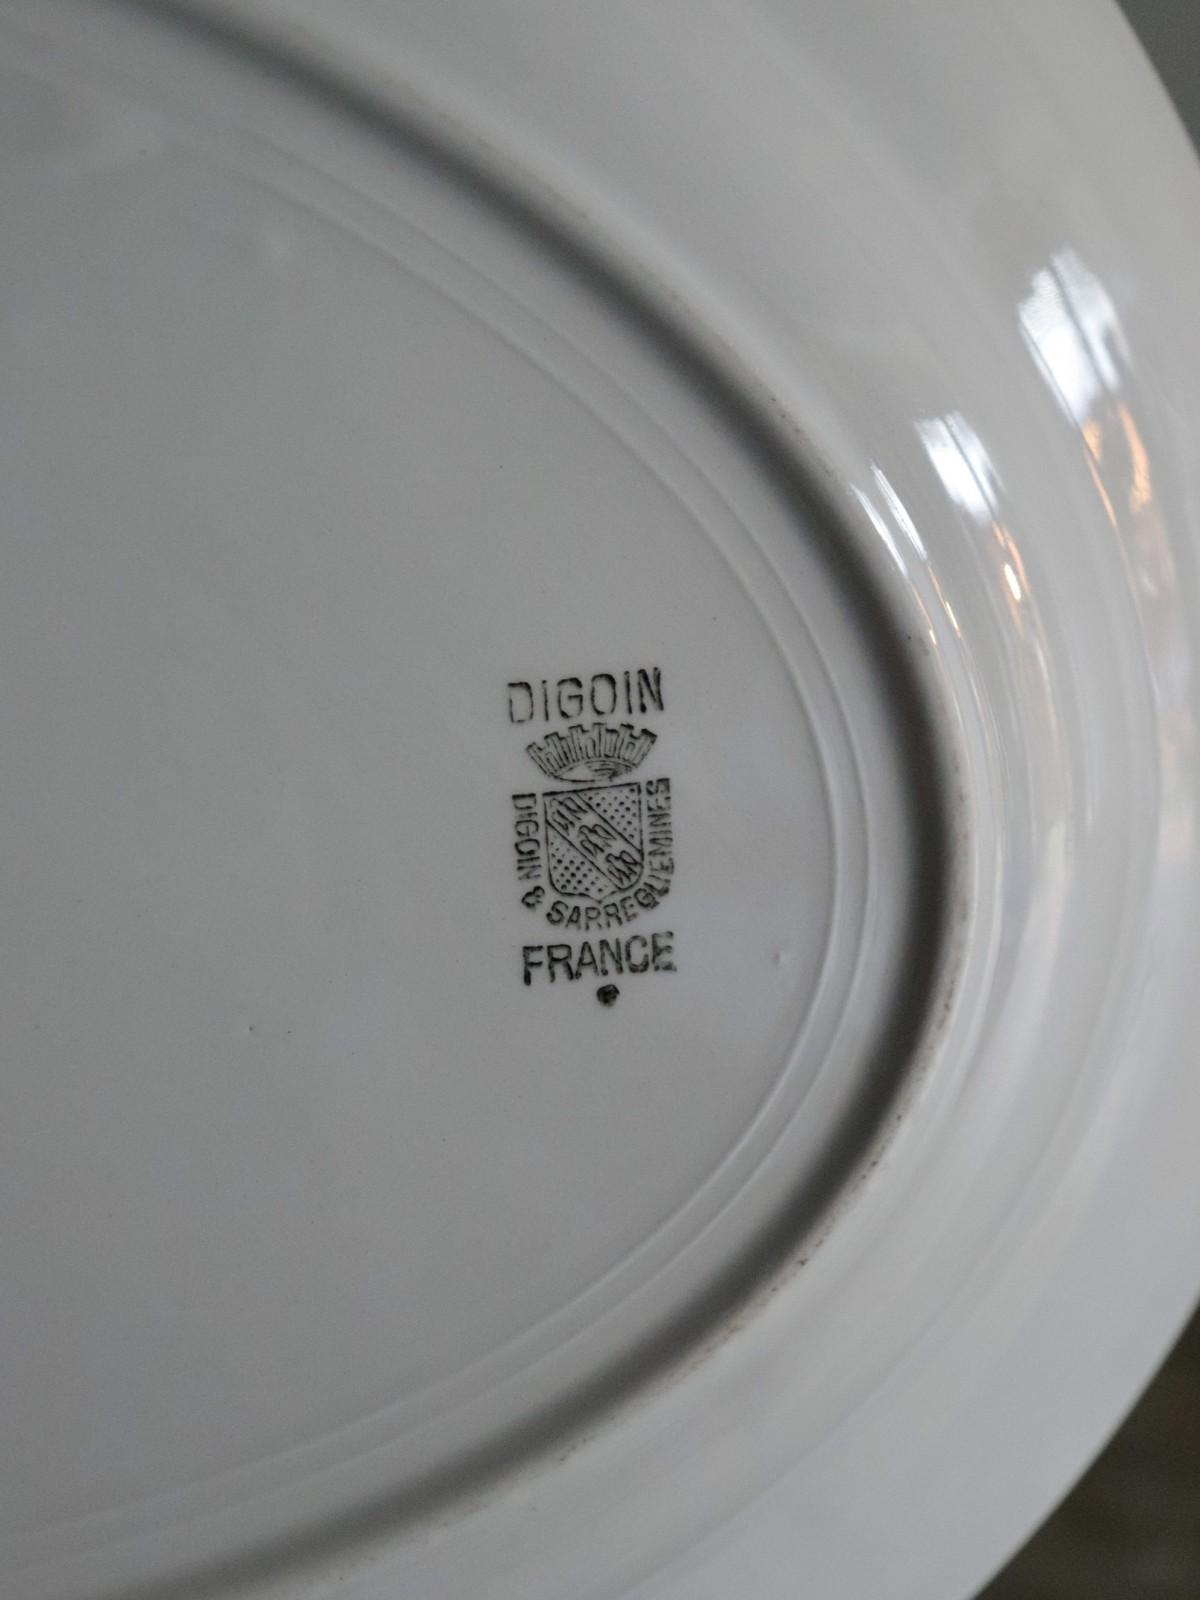 digoin, france, 1930's